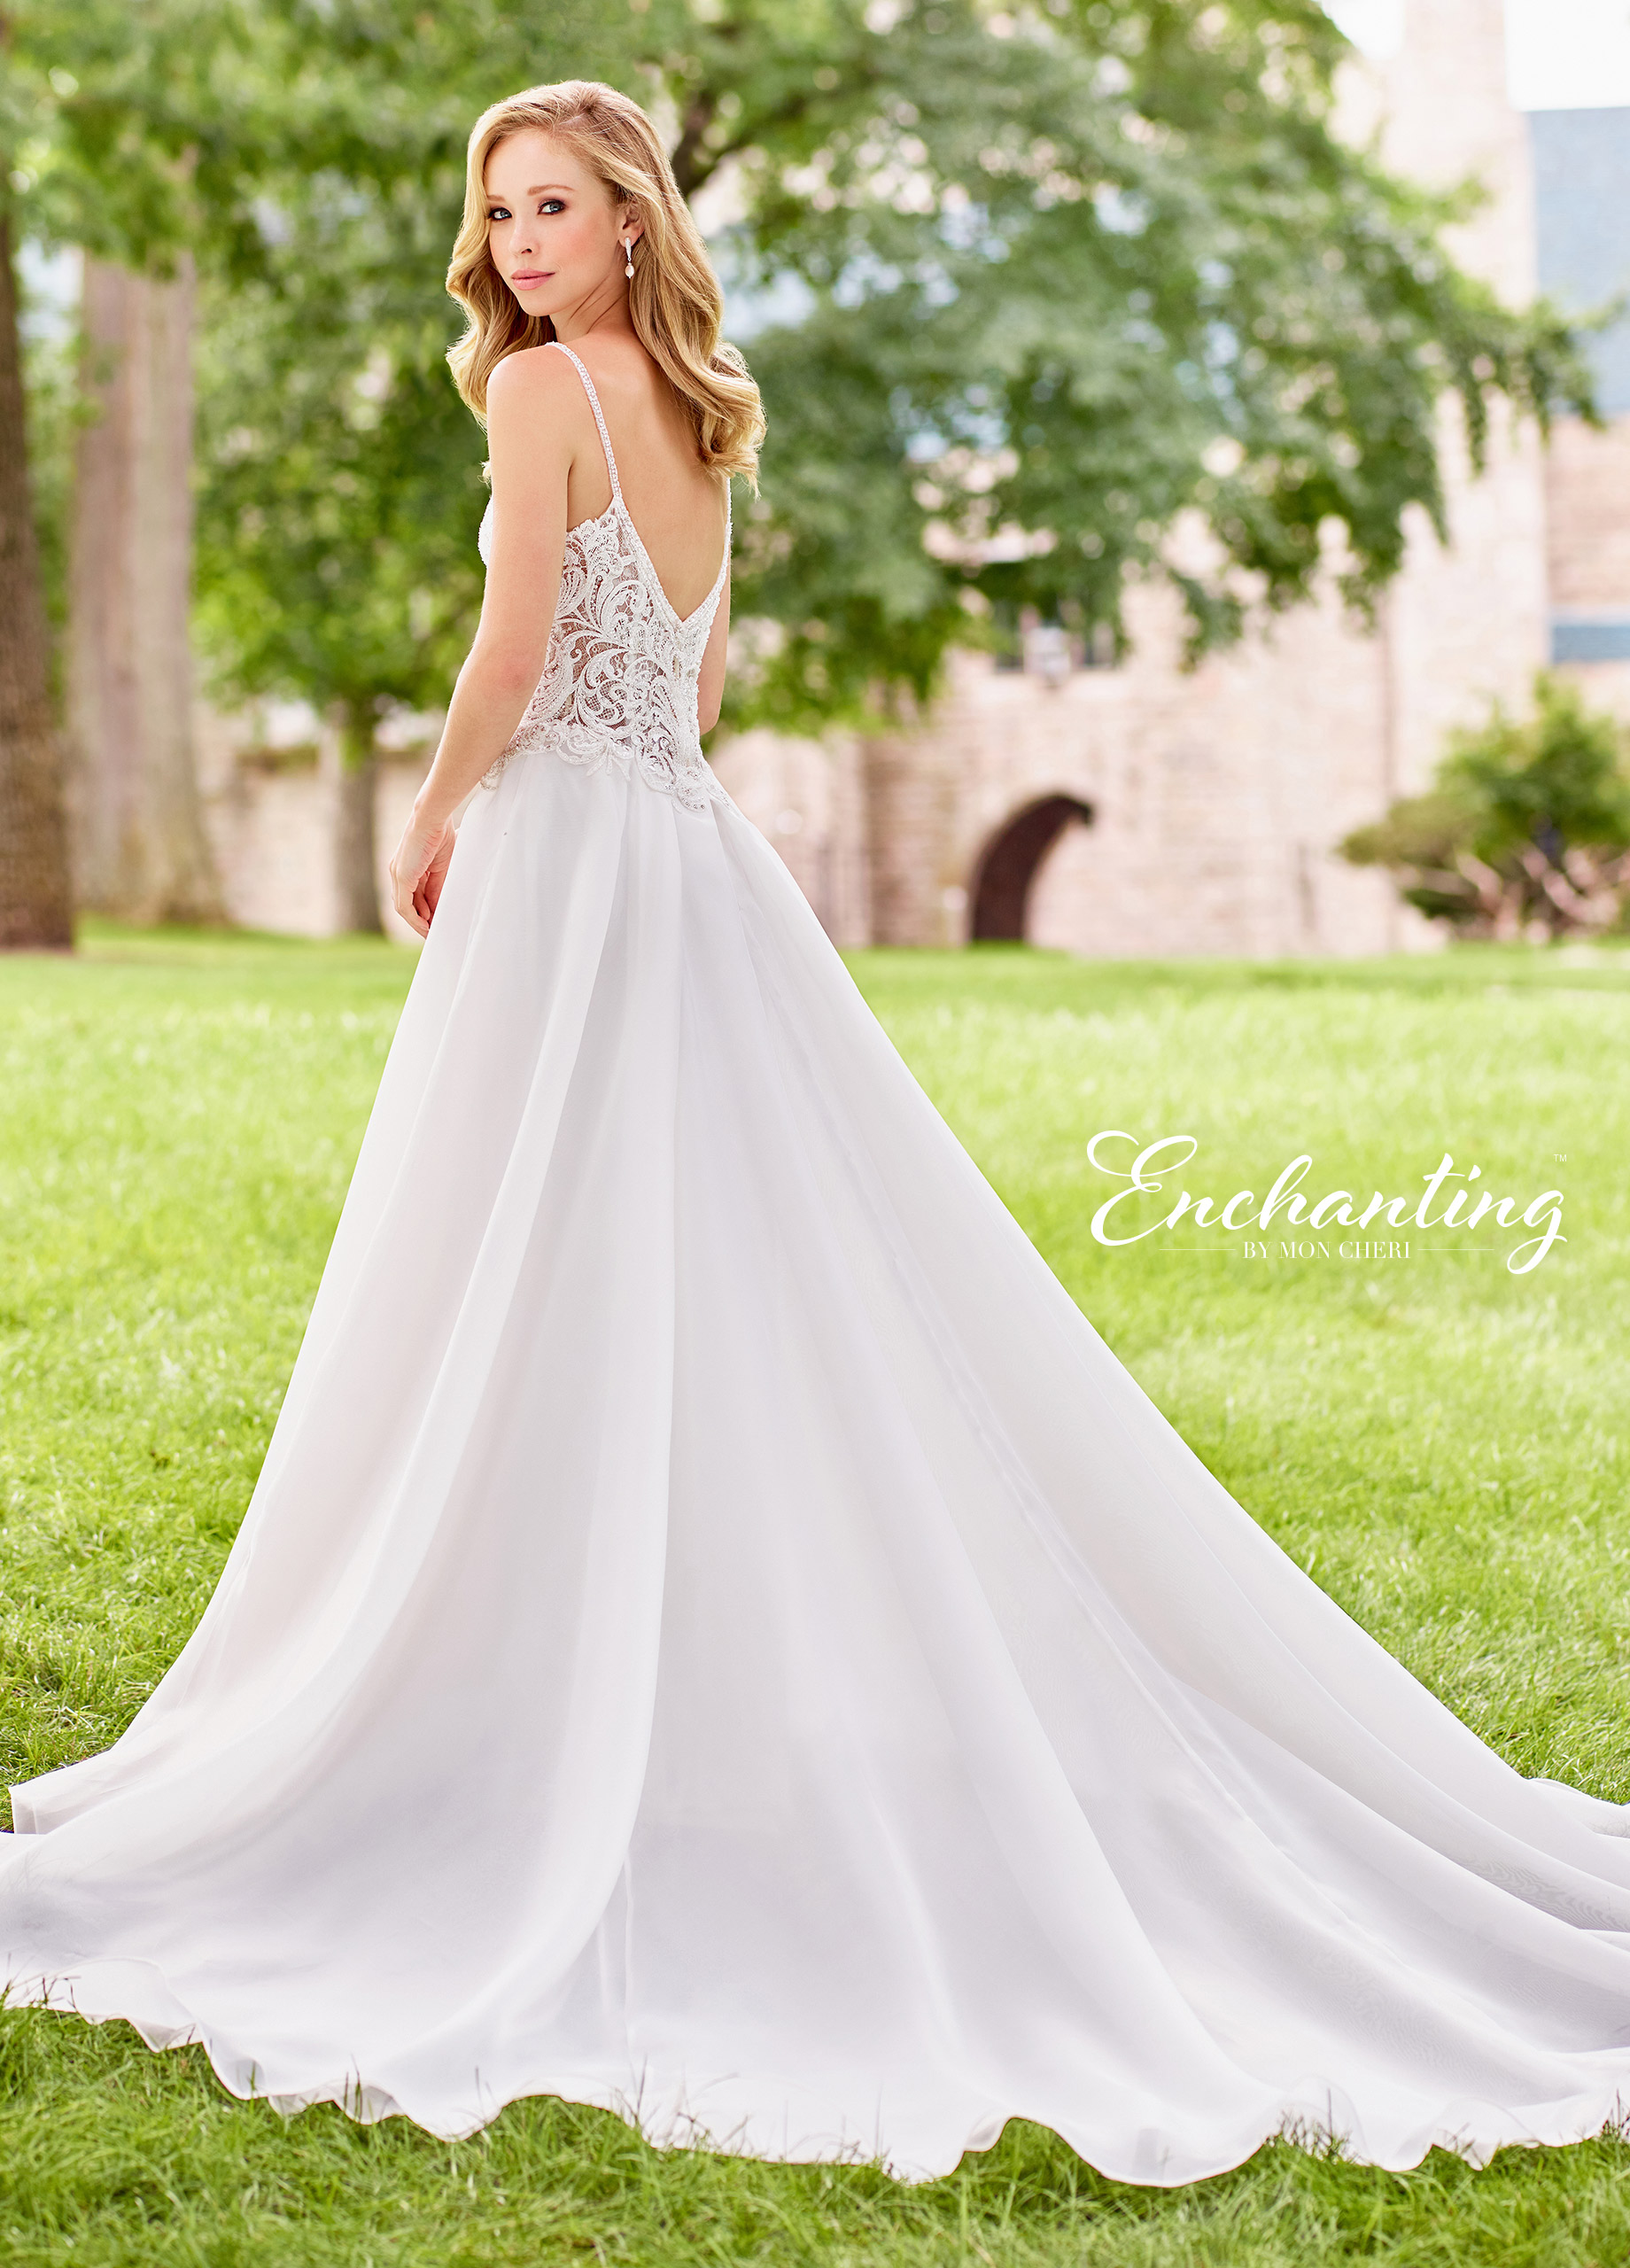 destination-wedding-dress-Enchanting-118137_B